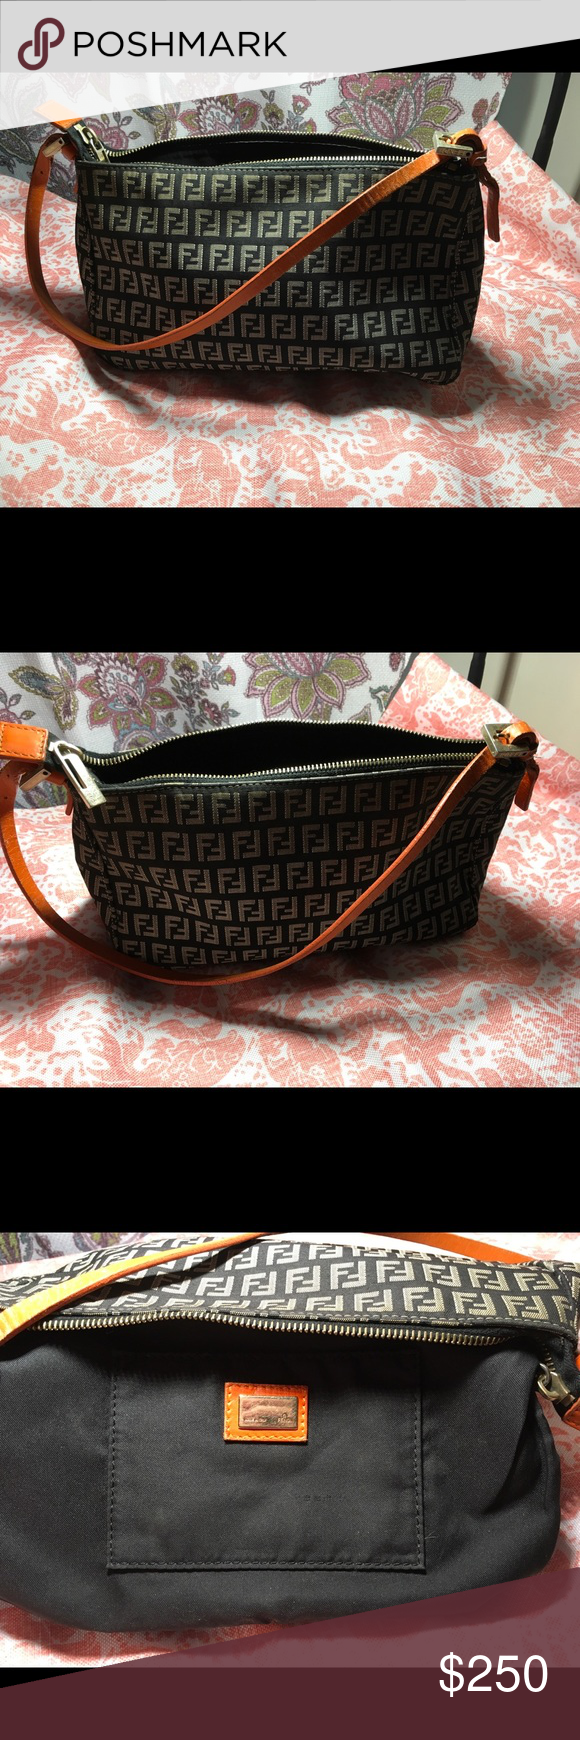 e44361a83846 Fendi small bag Small